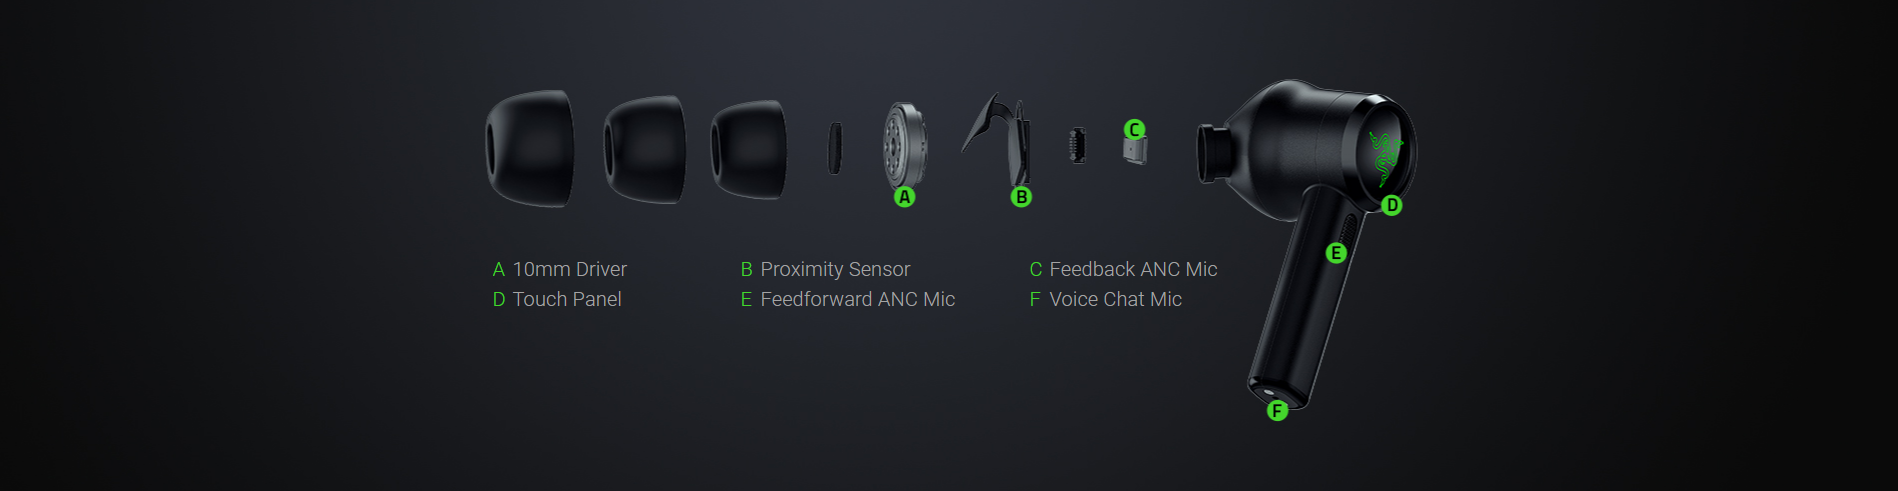 Kết cấu của Tai nghe Razer Hammerhead True Wireless Pro RZ12-03440100-R3A1